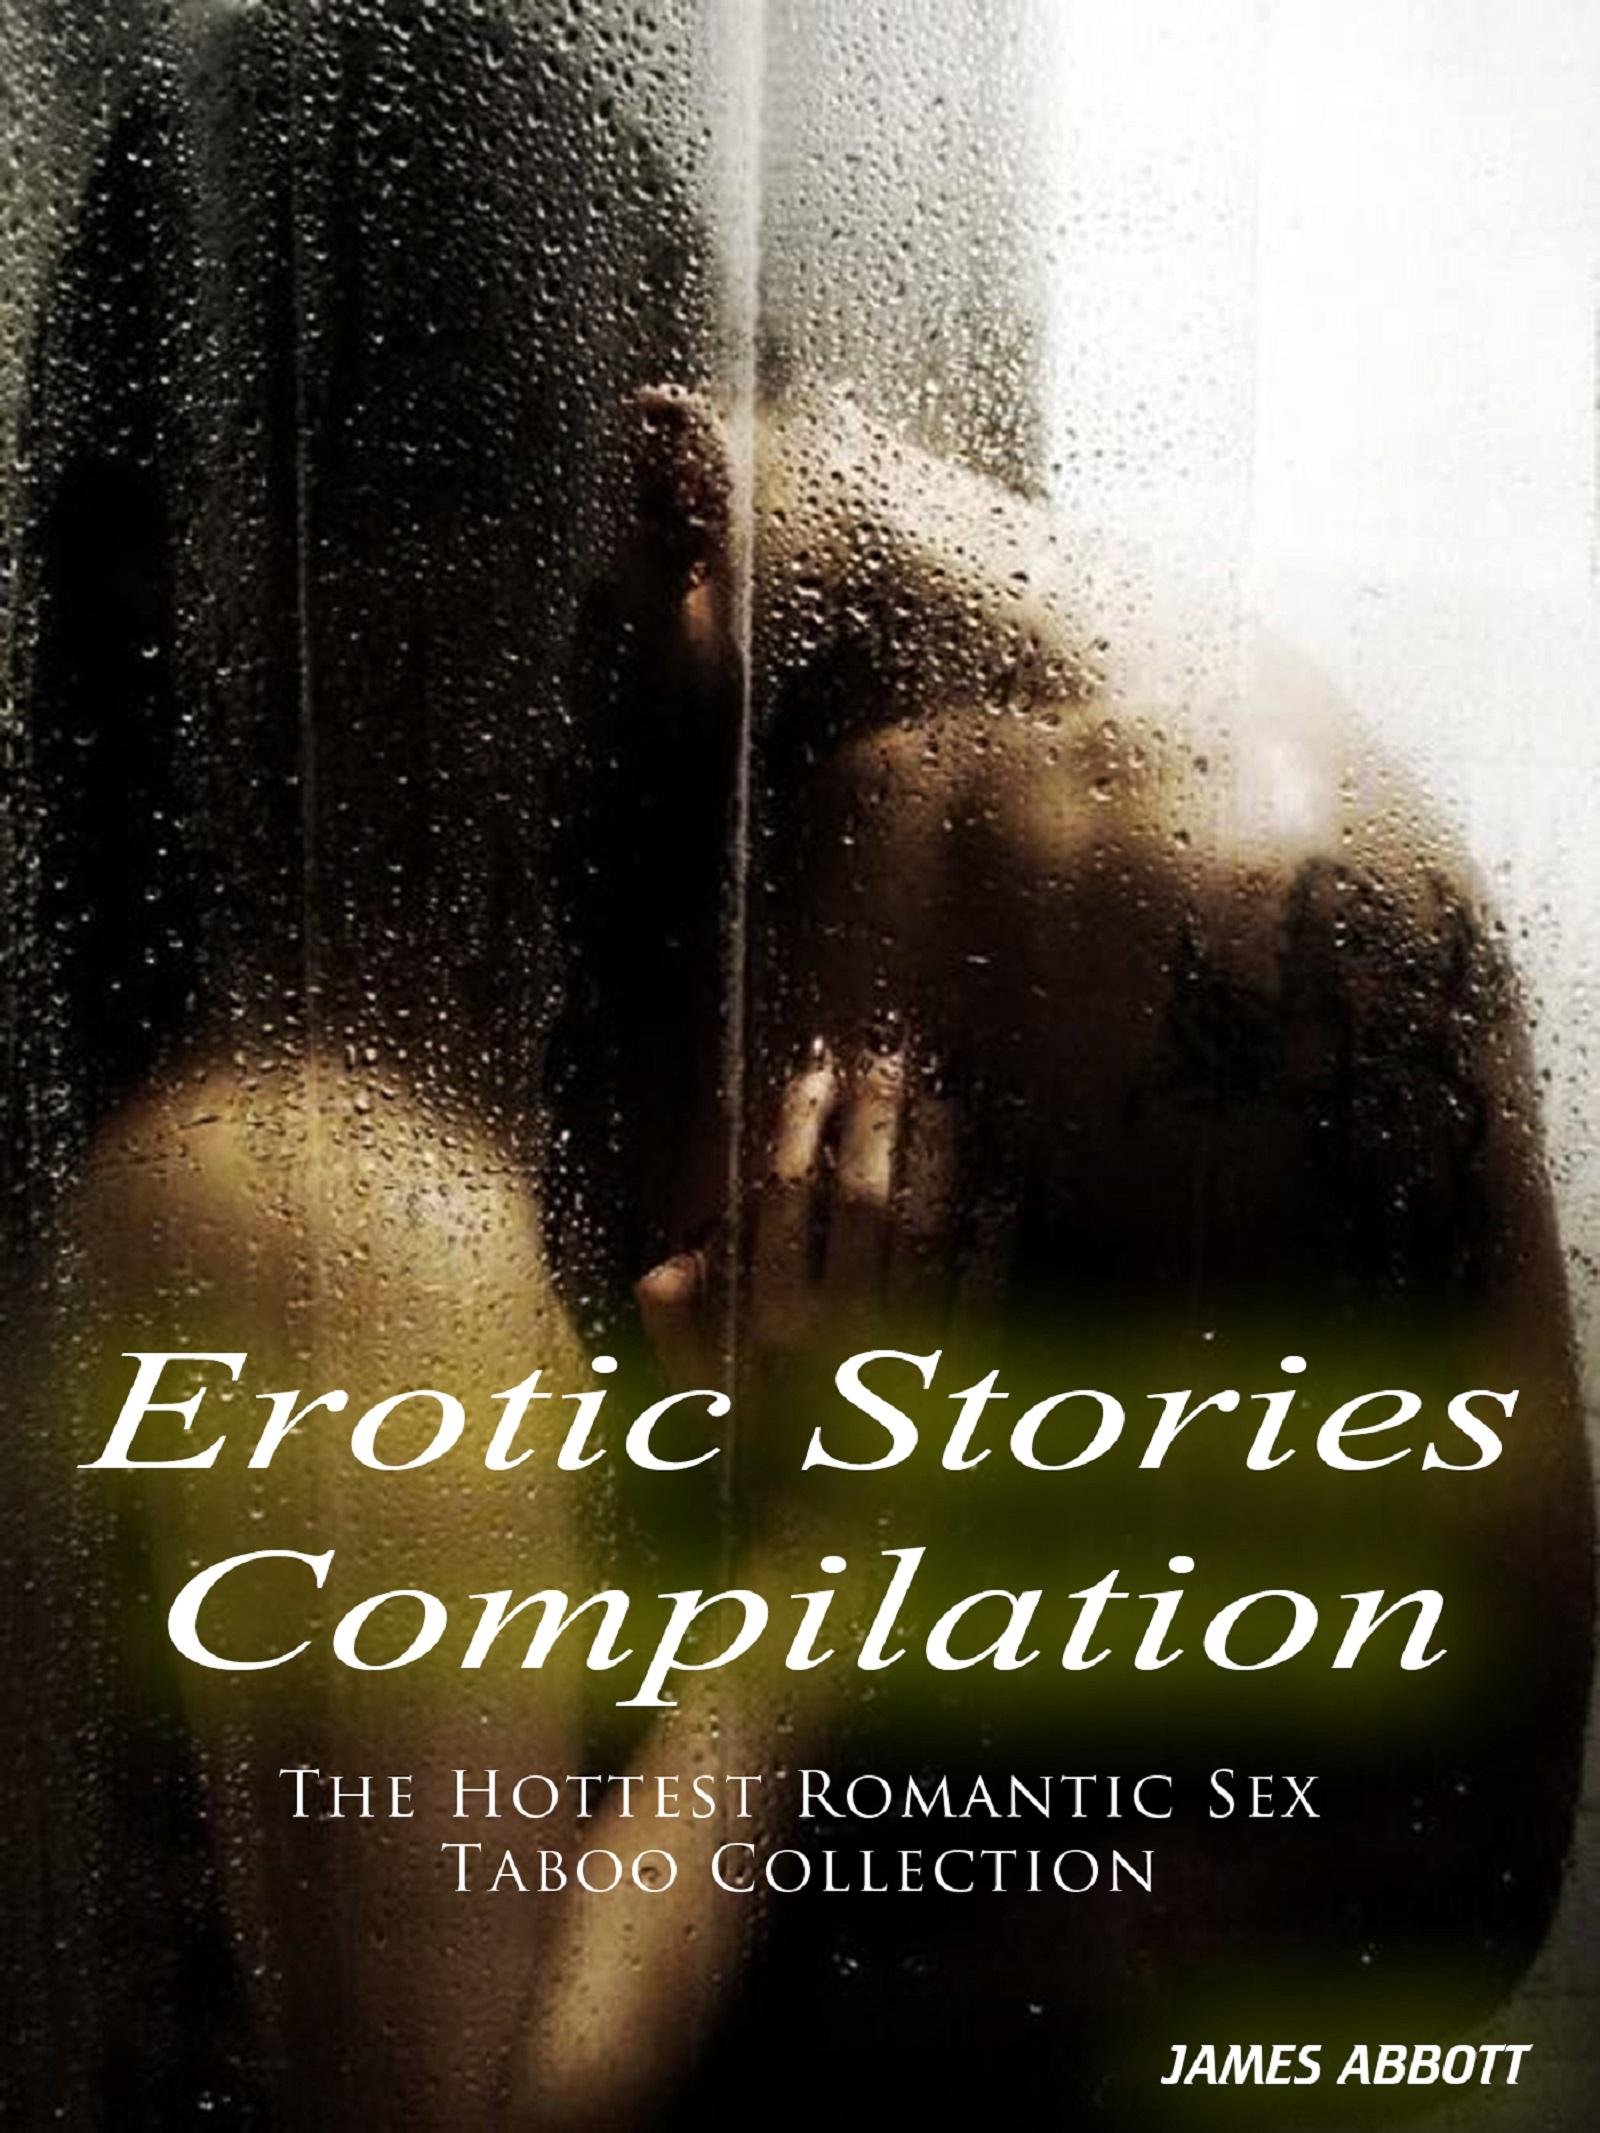 Romantic Erotic Story